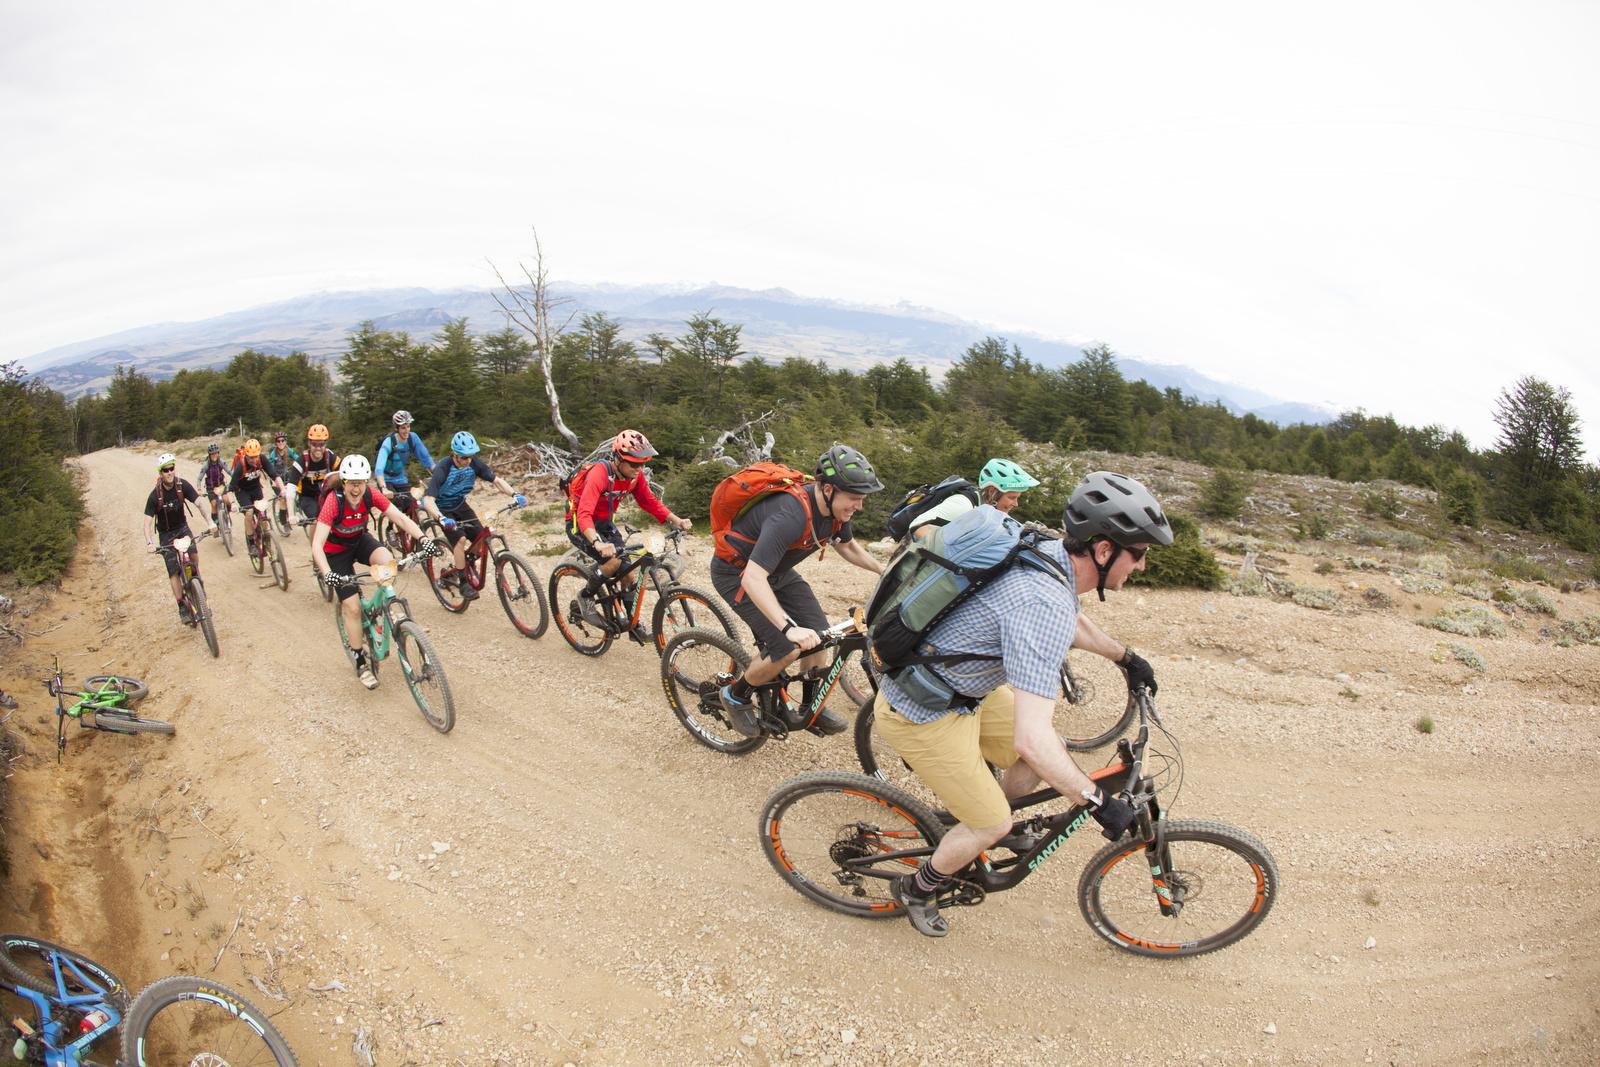 A bunch of journos and Santa Cruz staffers racing to the top of the mountain. Santa Cruz Rally de Aysen, Patagonia.  photo : therodfather